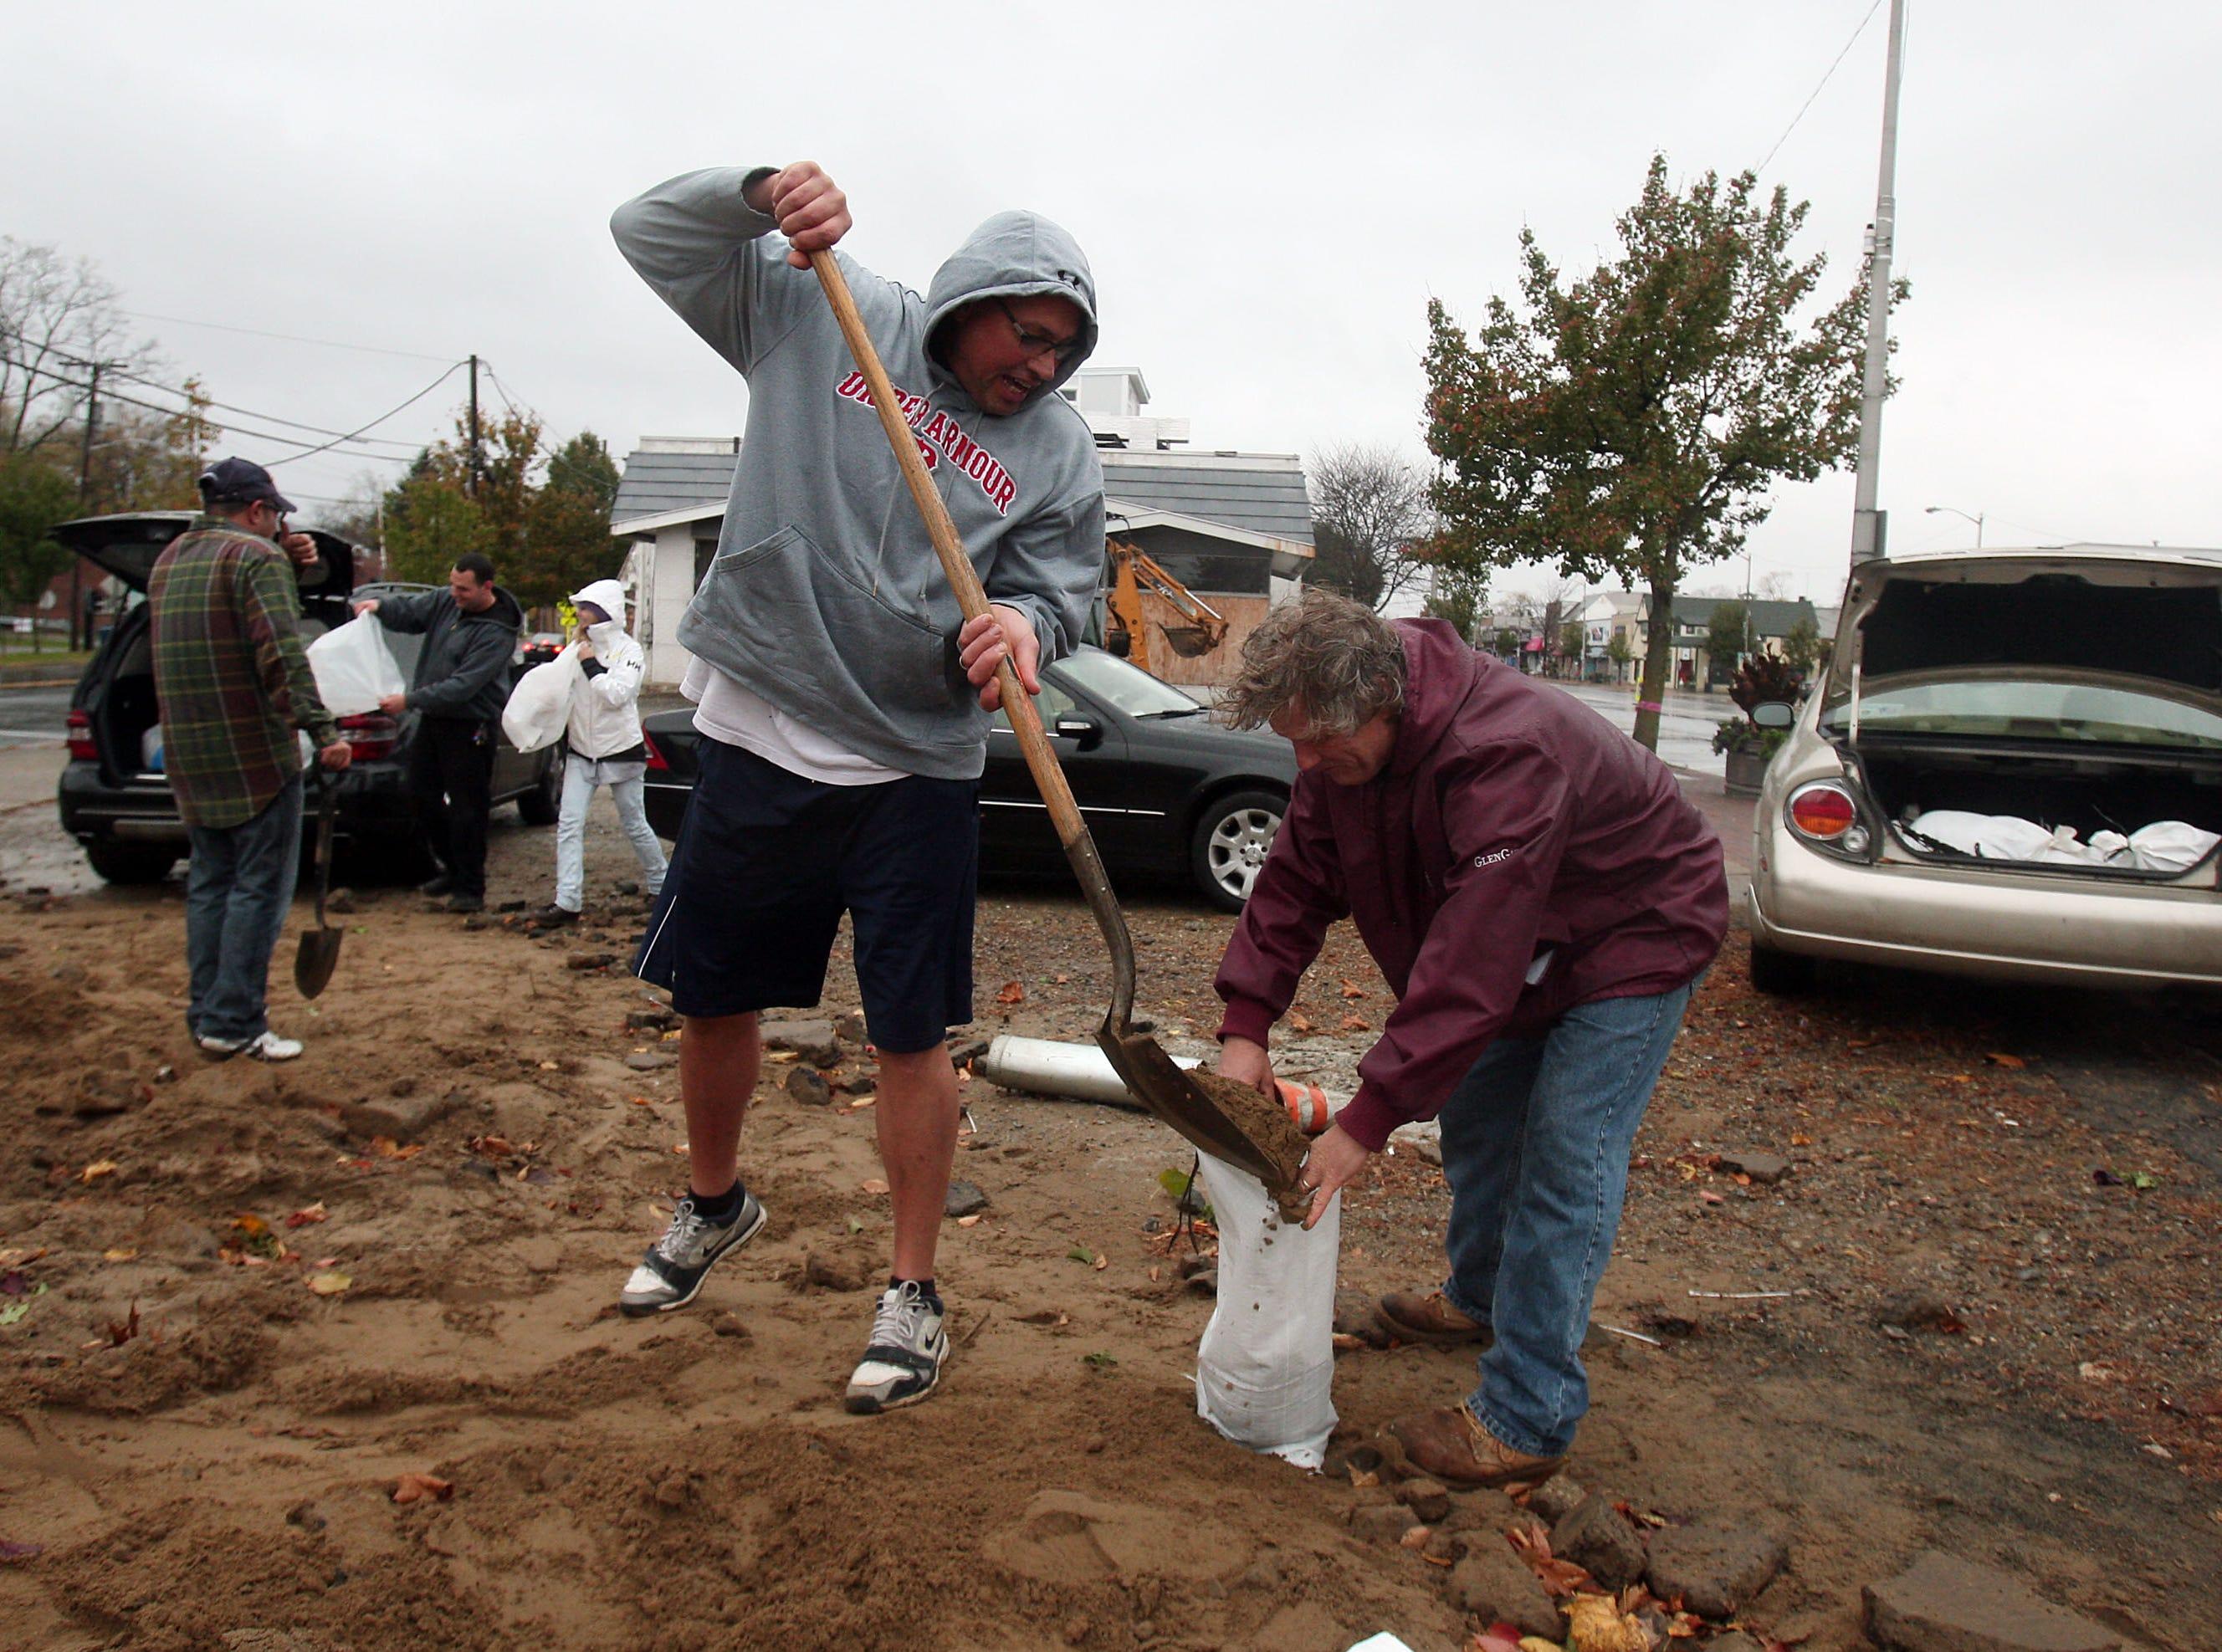 Denville,NJ-- October 29, 2012--Bill Schicke of Denville, NJ , l, and Jeff Sintic of Denville, NJ fill up sandbags in downtown Denville, NJ in preparation for Hurricane Sandy's approach.Bob Karp/Staff Photographer/DAILY RECORD